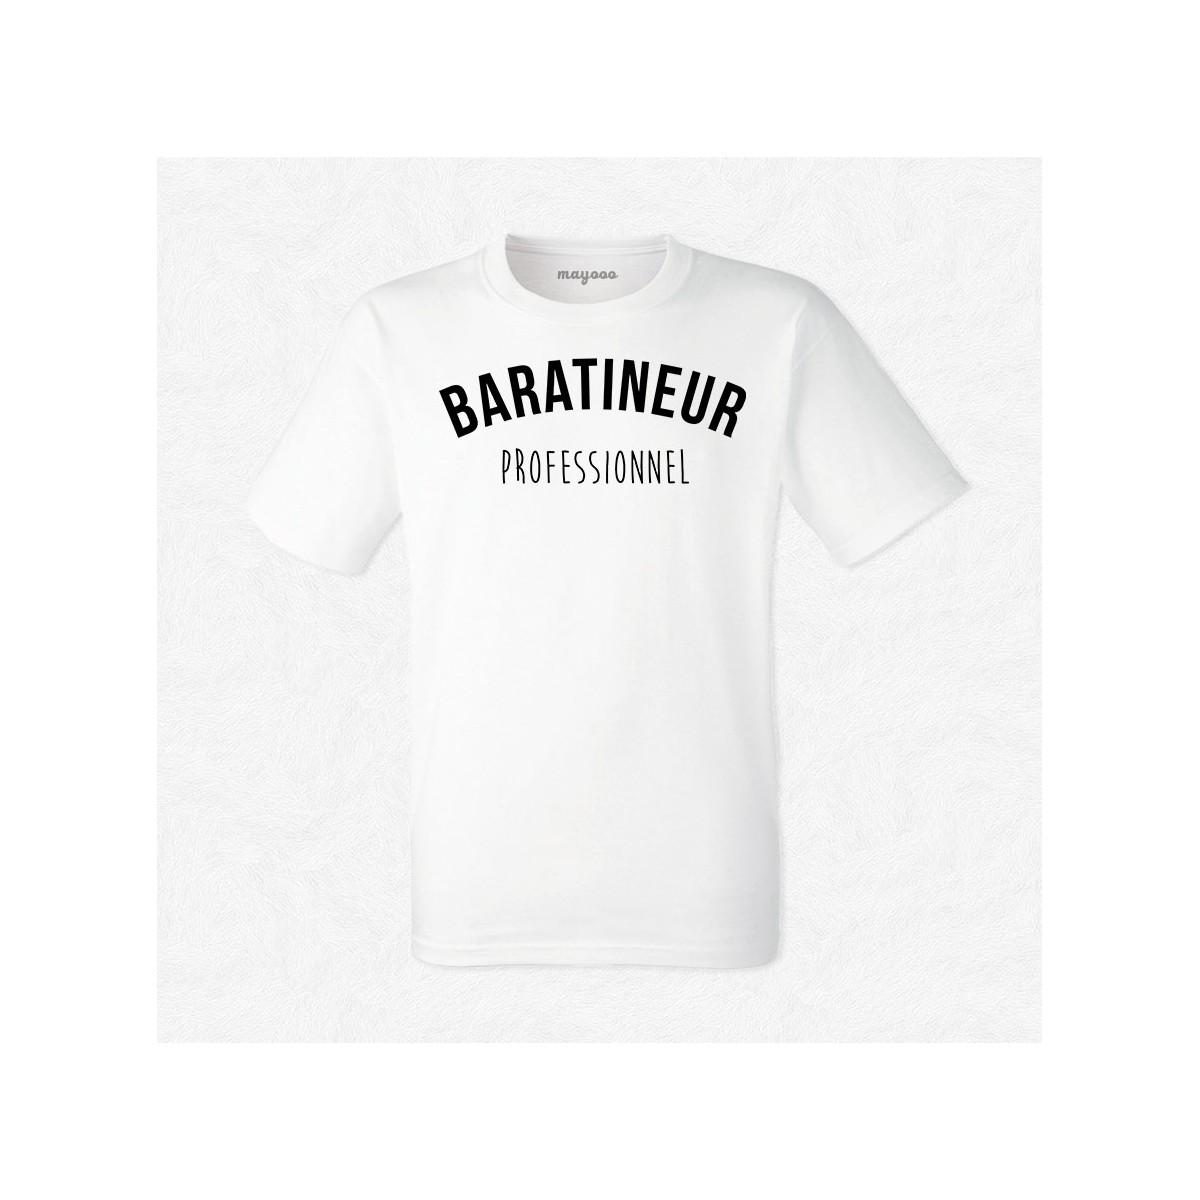 T-shirt Baratineur professionnel